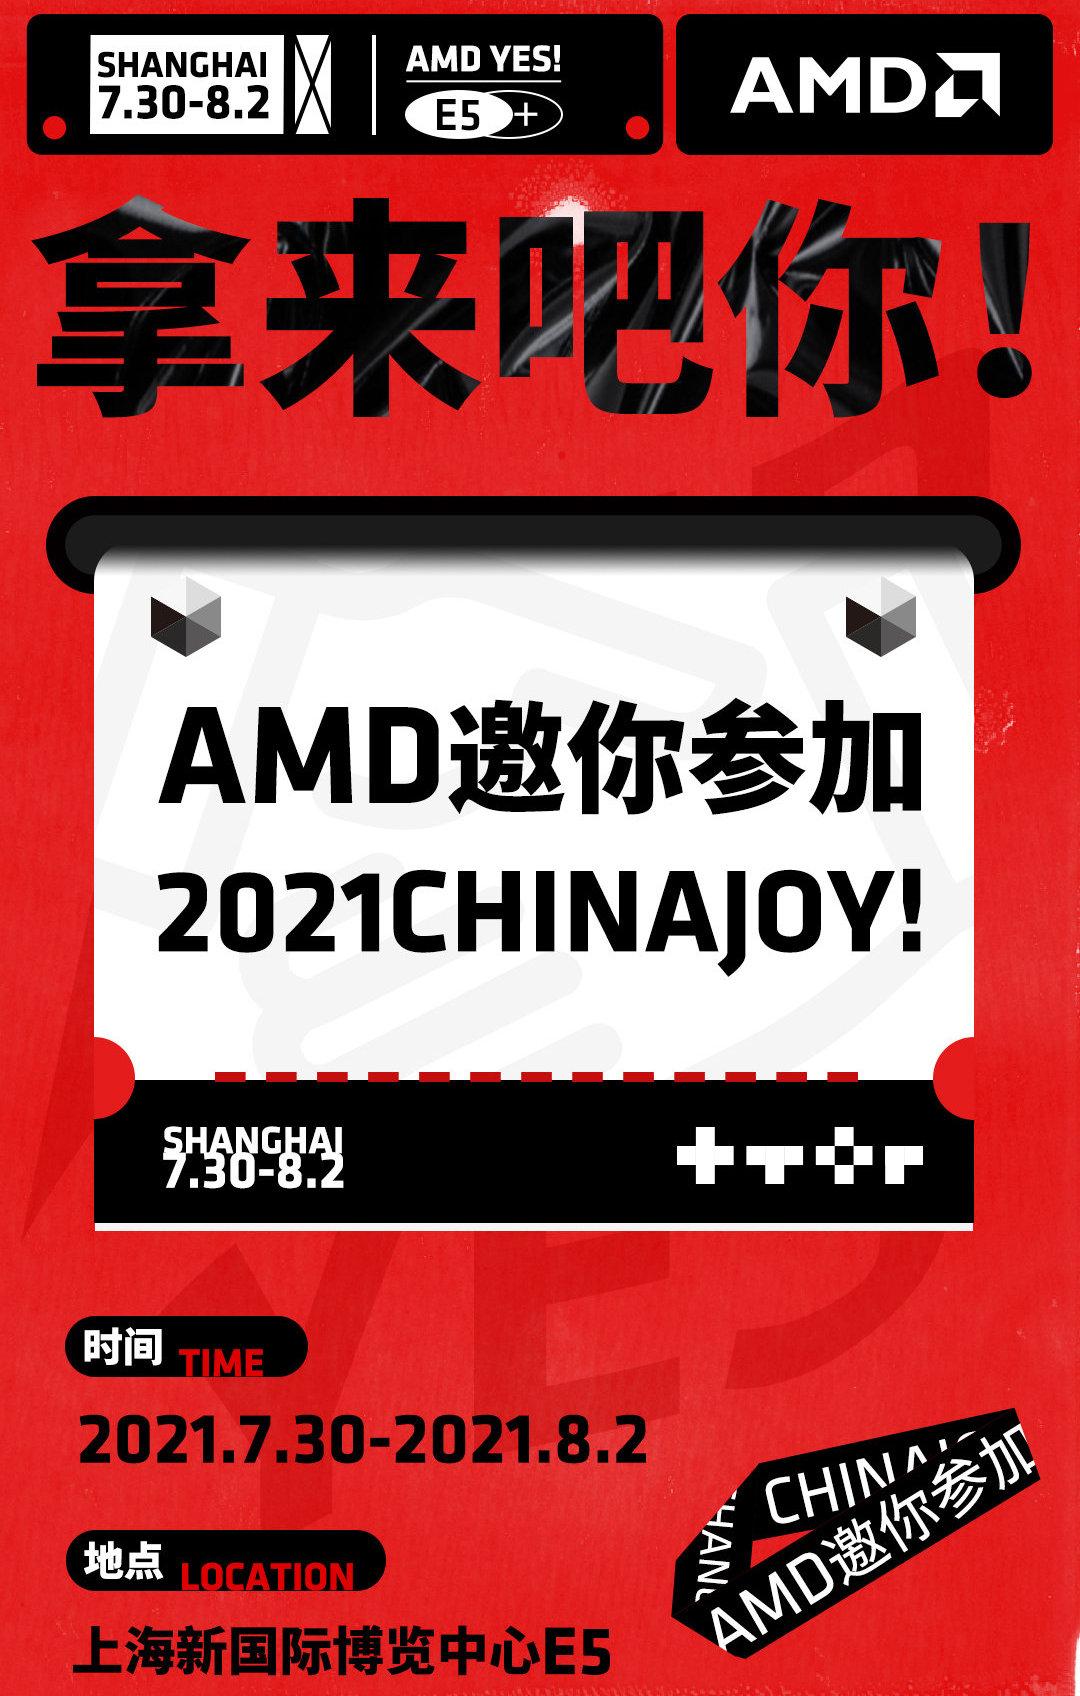 AMD представит Radeon RX 6600 XT на выставке Chinajoy 2021